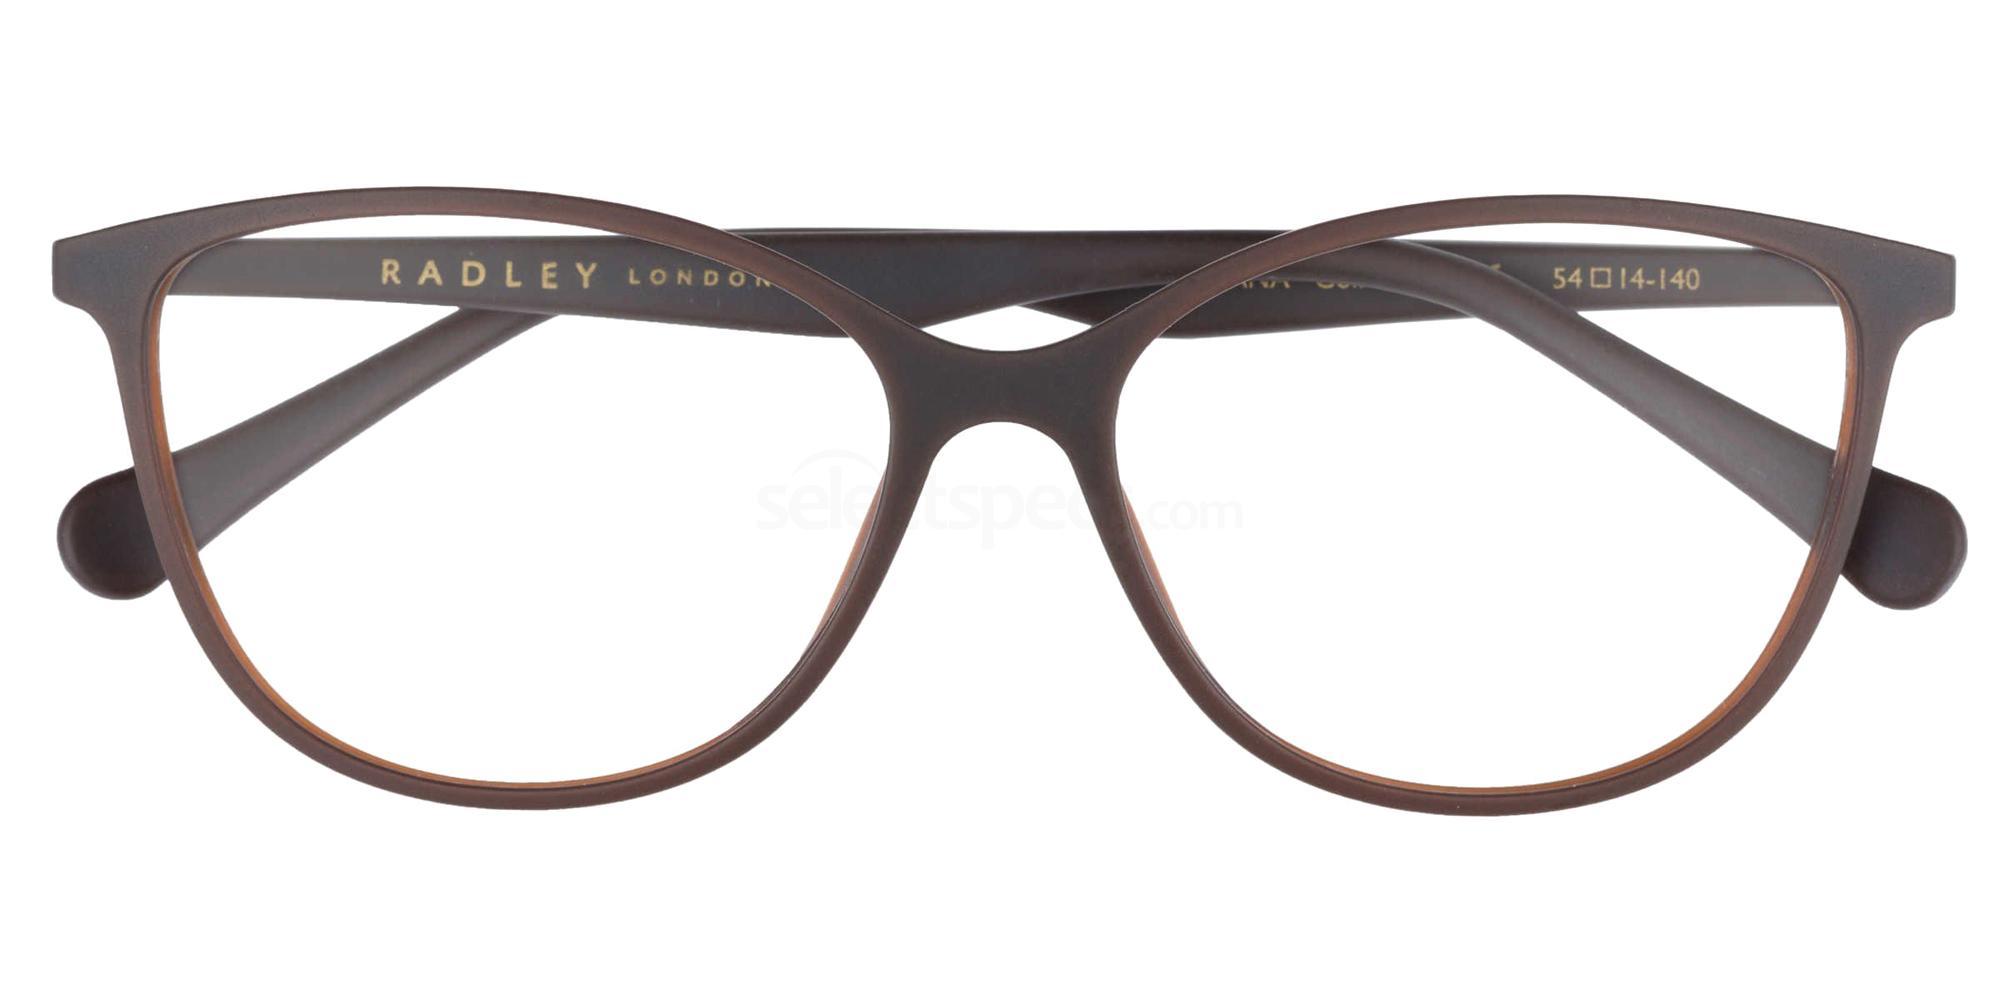 103 RDO-AVIANA Glasses, Radley London